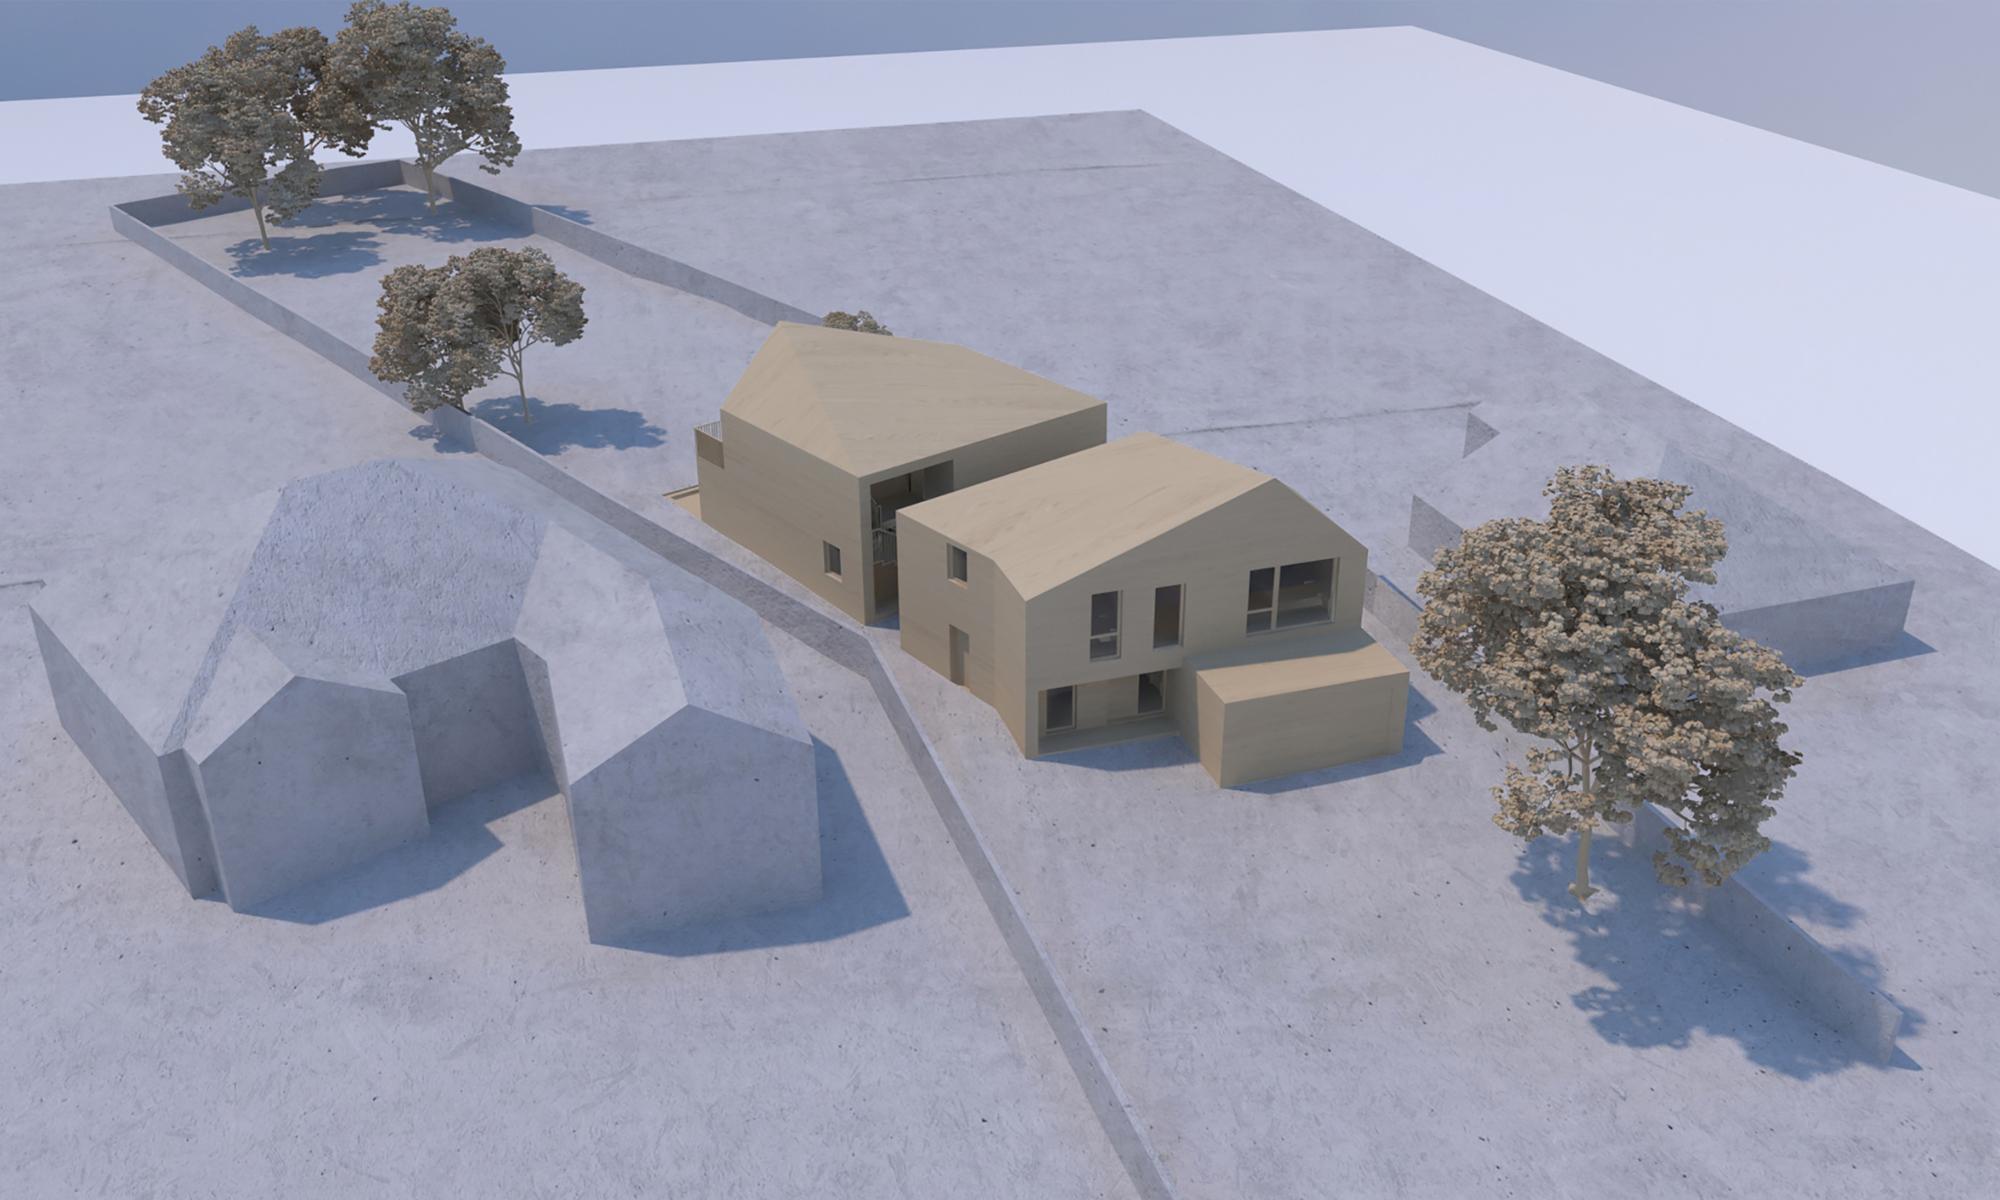 New build model concept 3